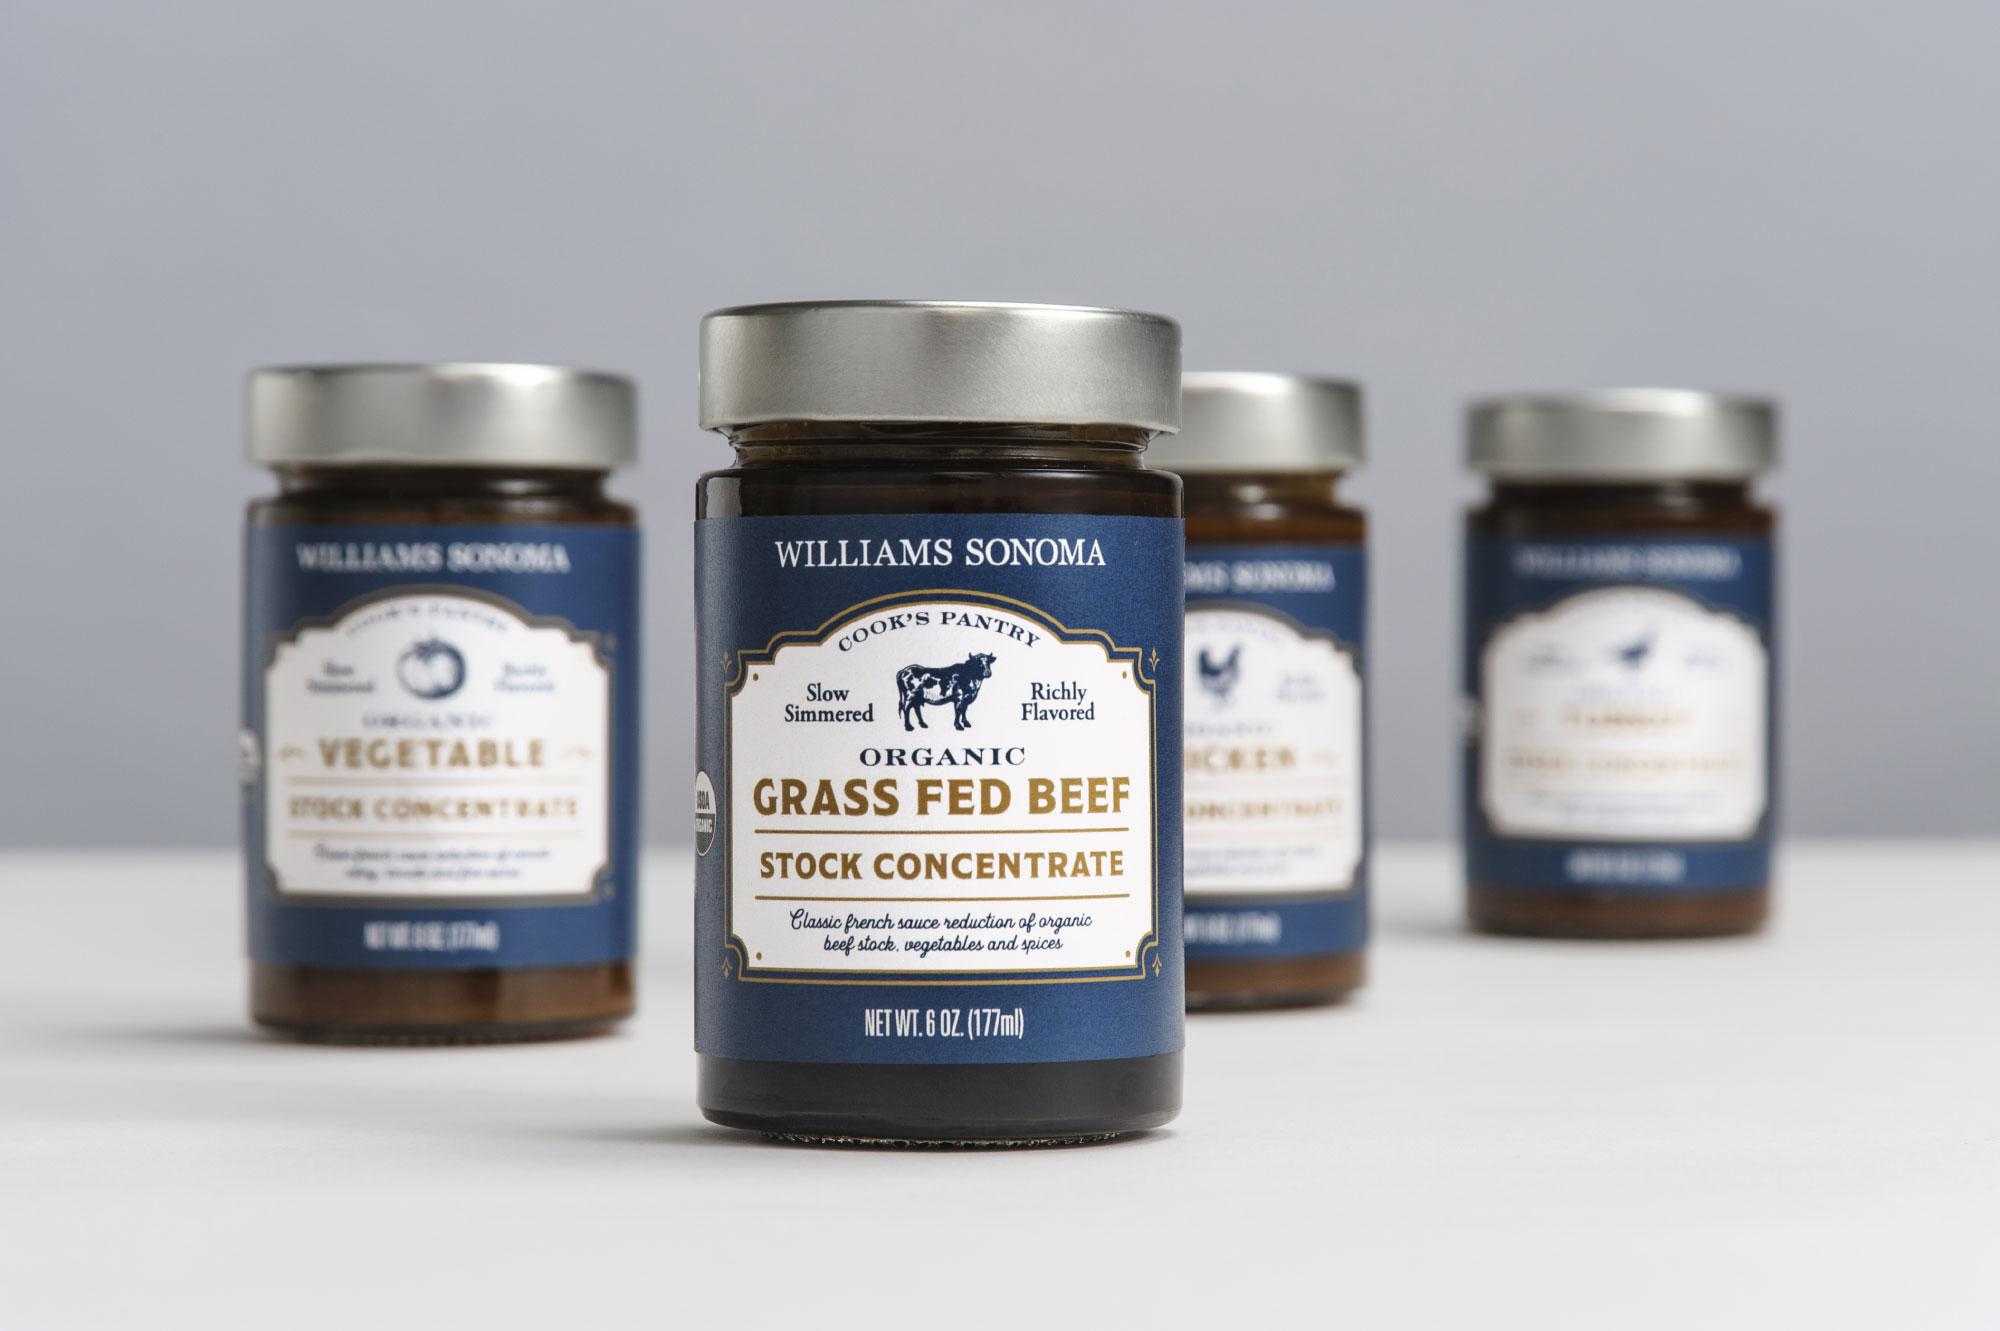 Williams Sonoma - All Stocks